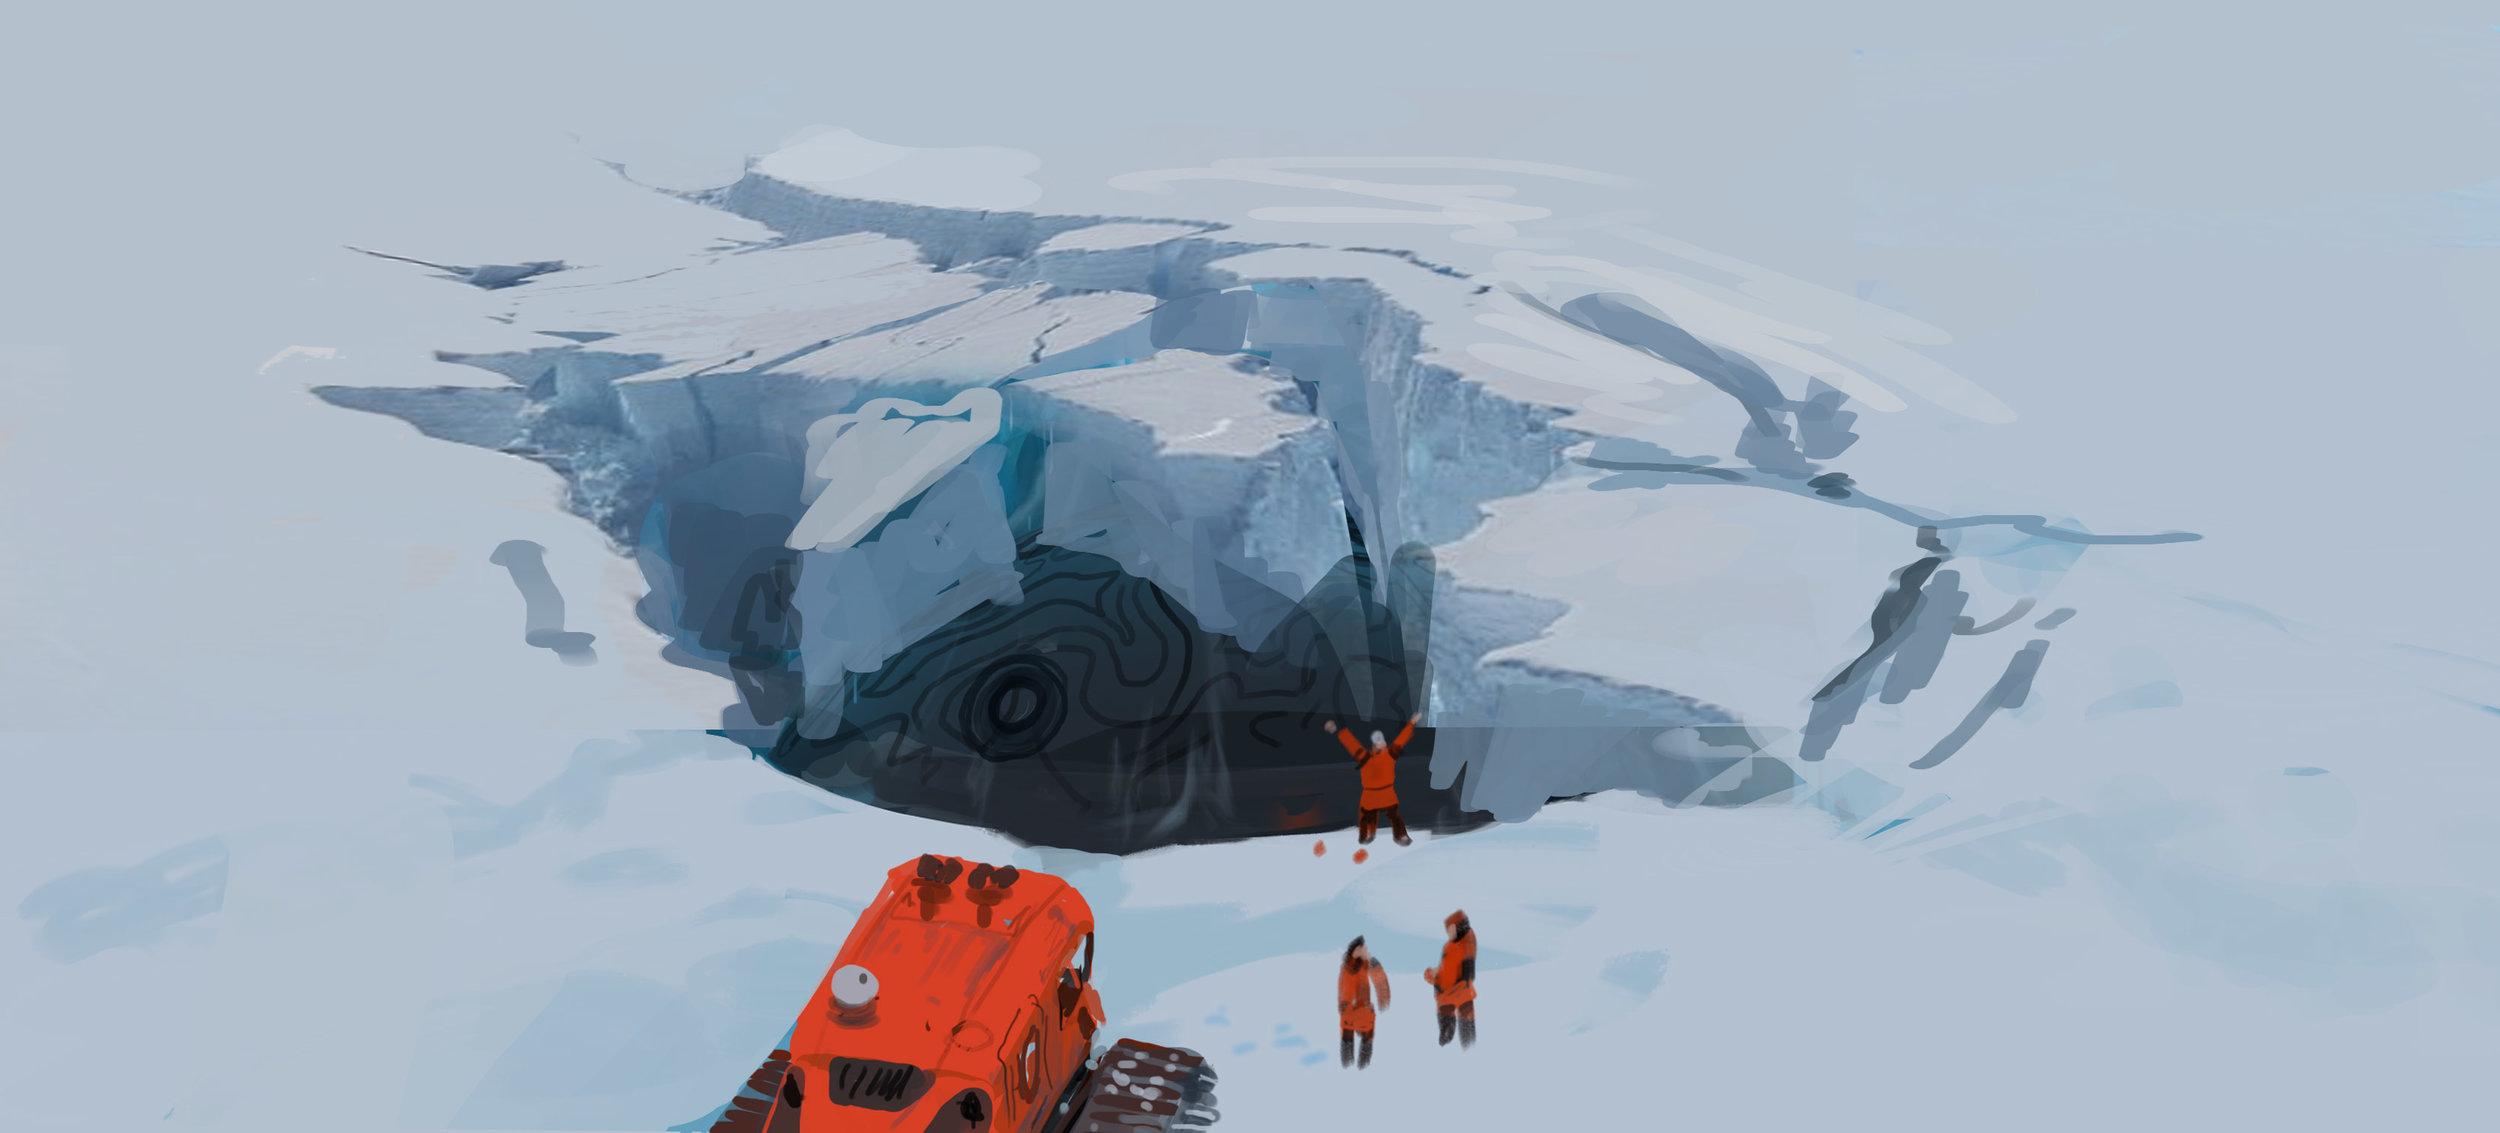 Ice_undersurface_01-2018-12-1-0.35.57.jpg